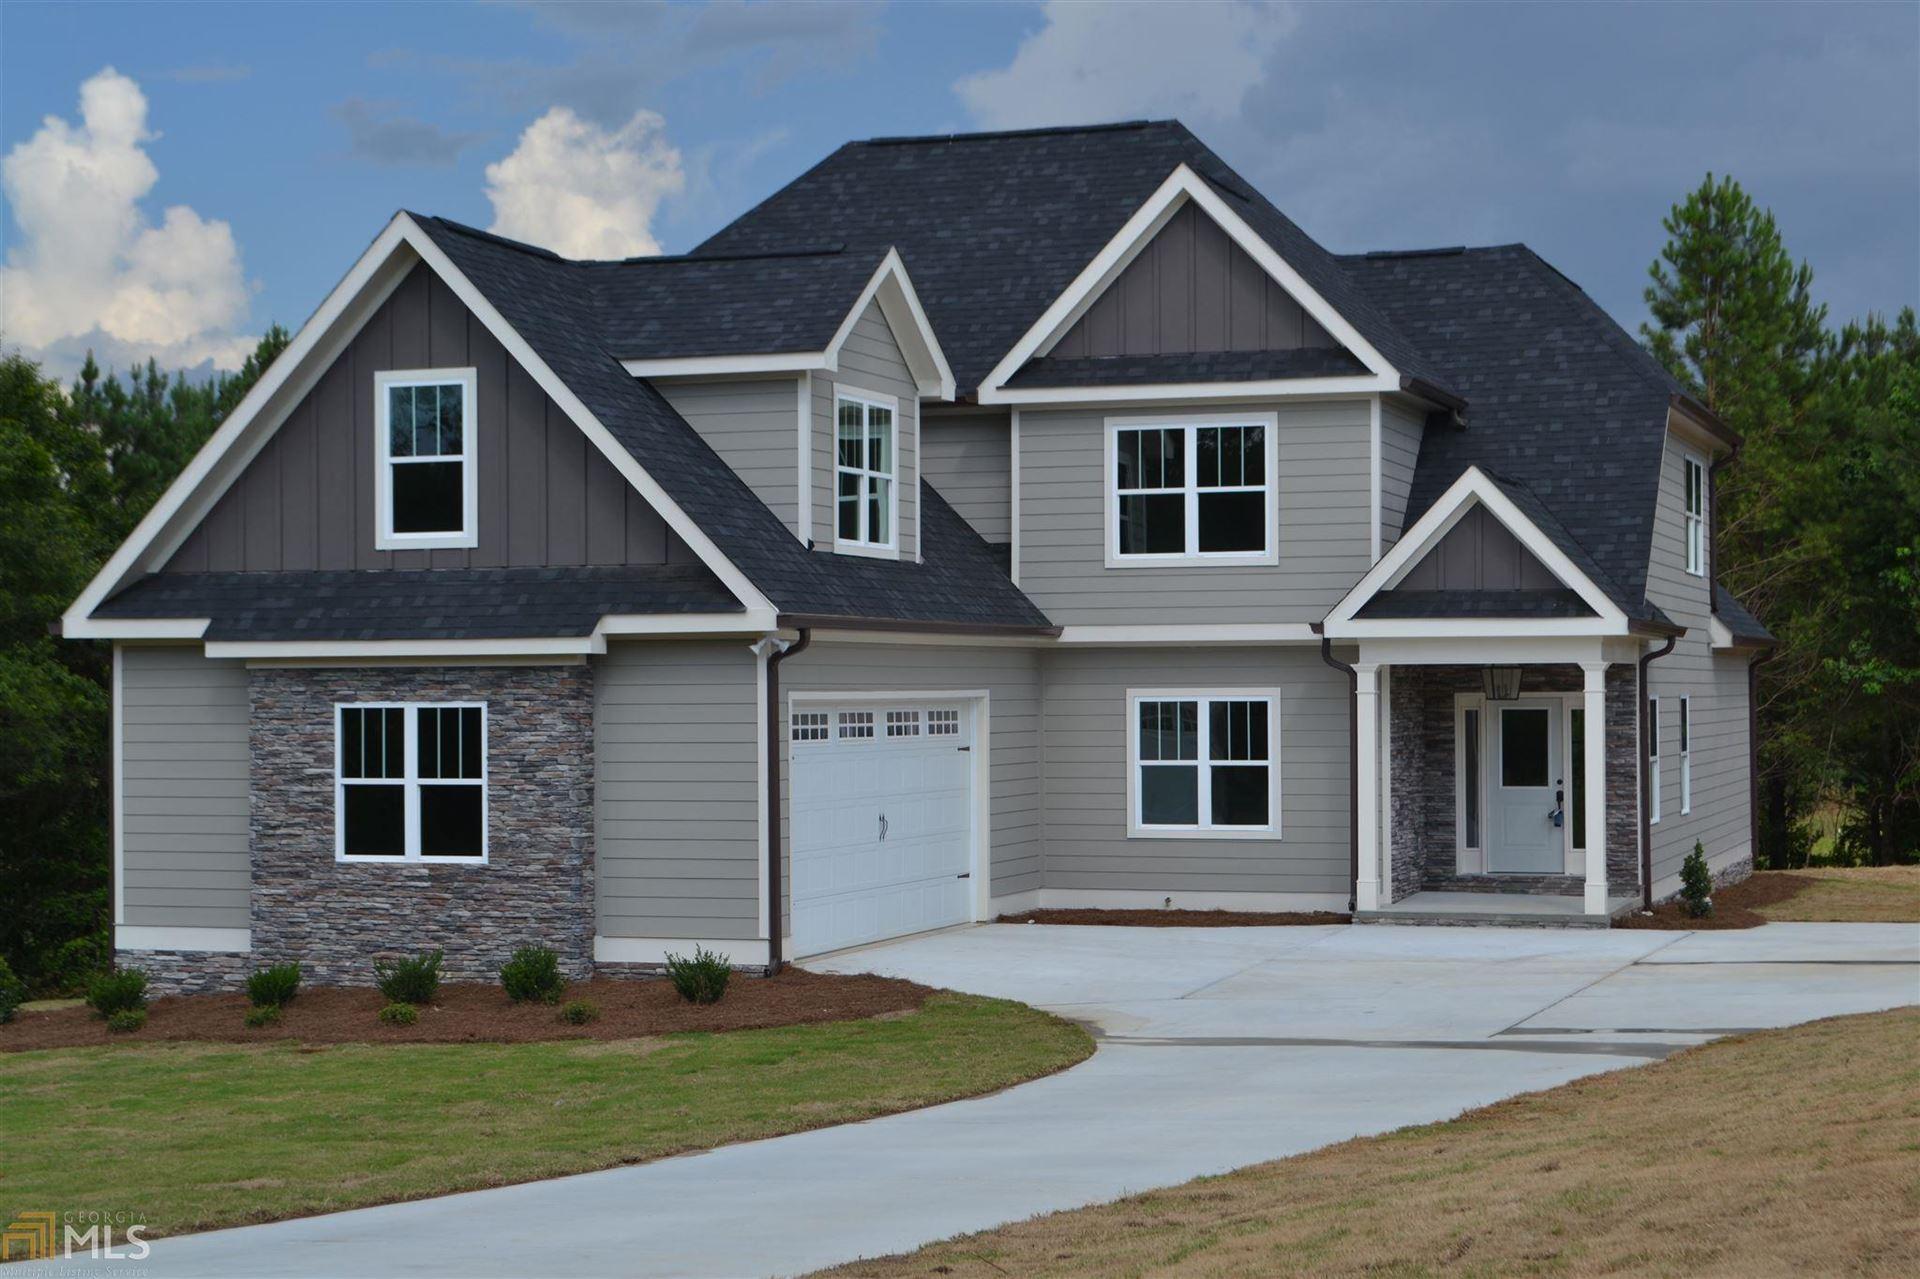 125 Suzanne Ct, Fayetteville, GA 30214 - MLS#: 8791836